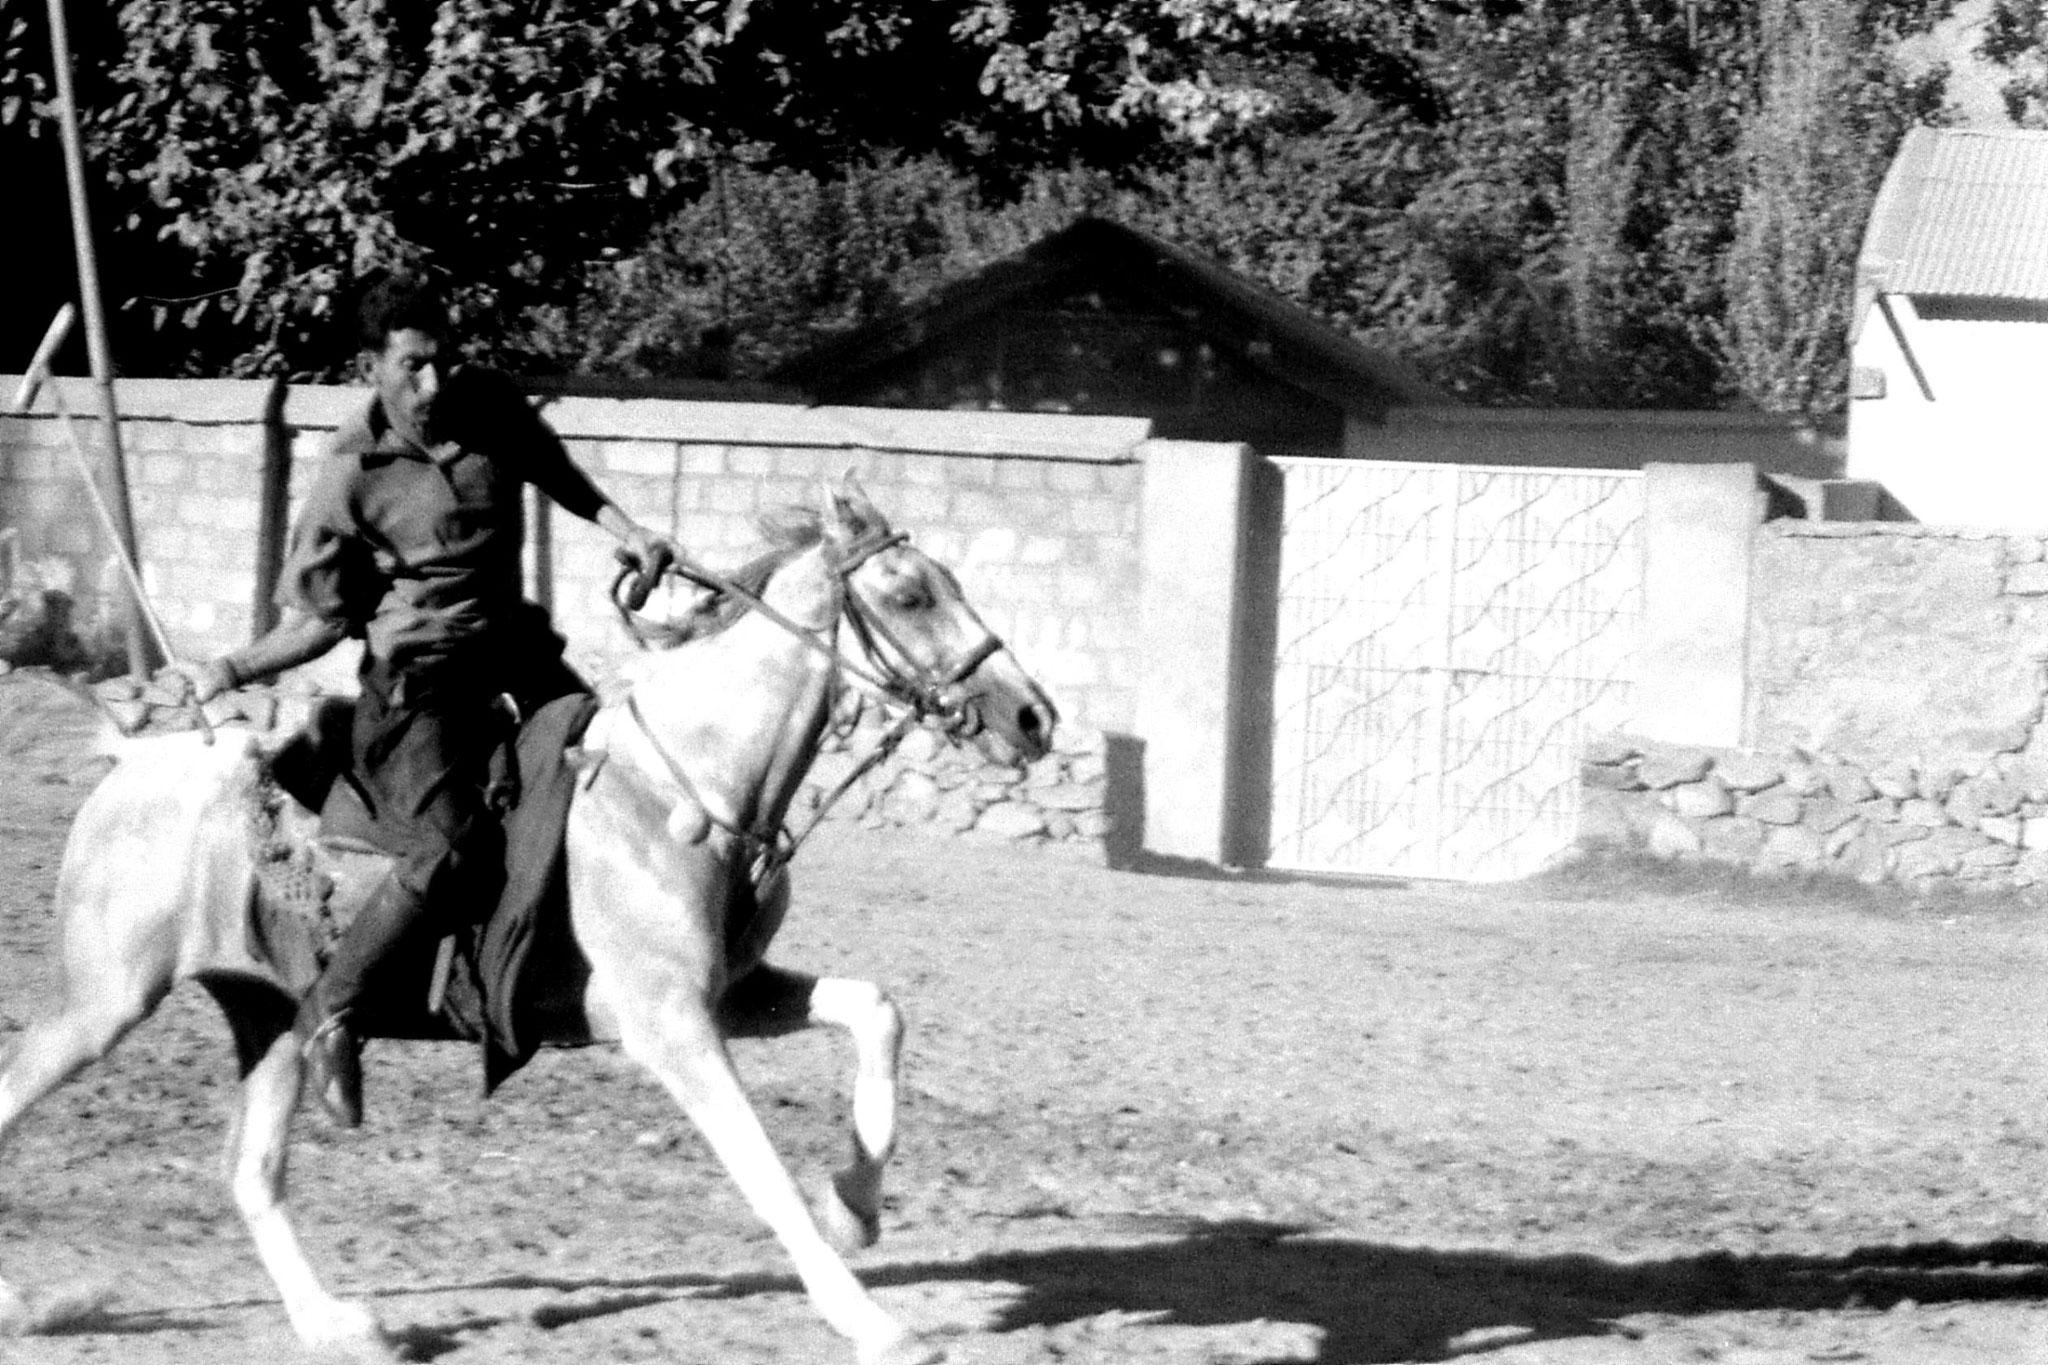 9/10/1989: 5: Gilgit polo match